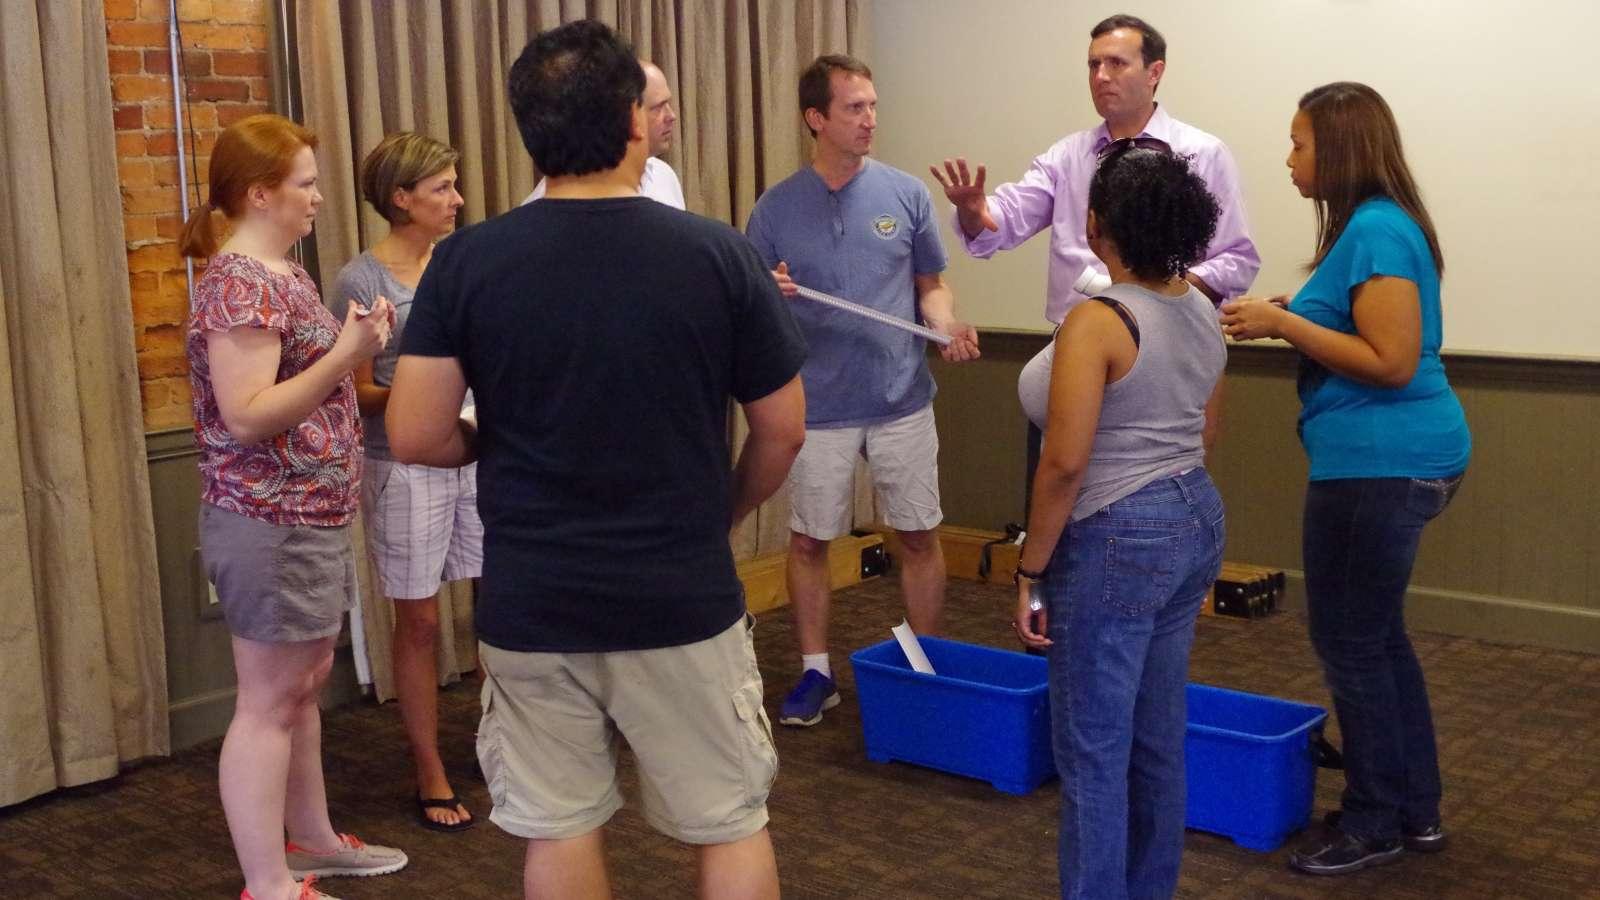 hands-on teamwork challenges